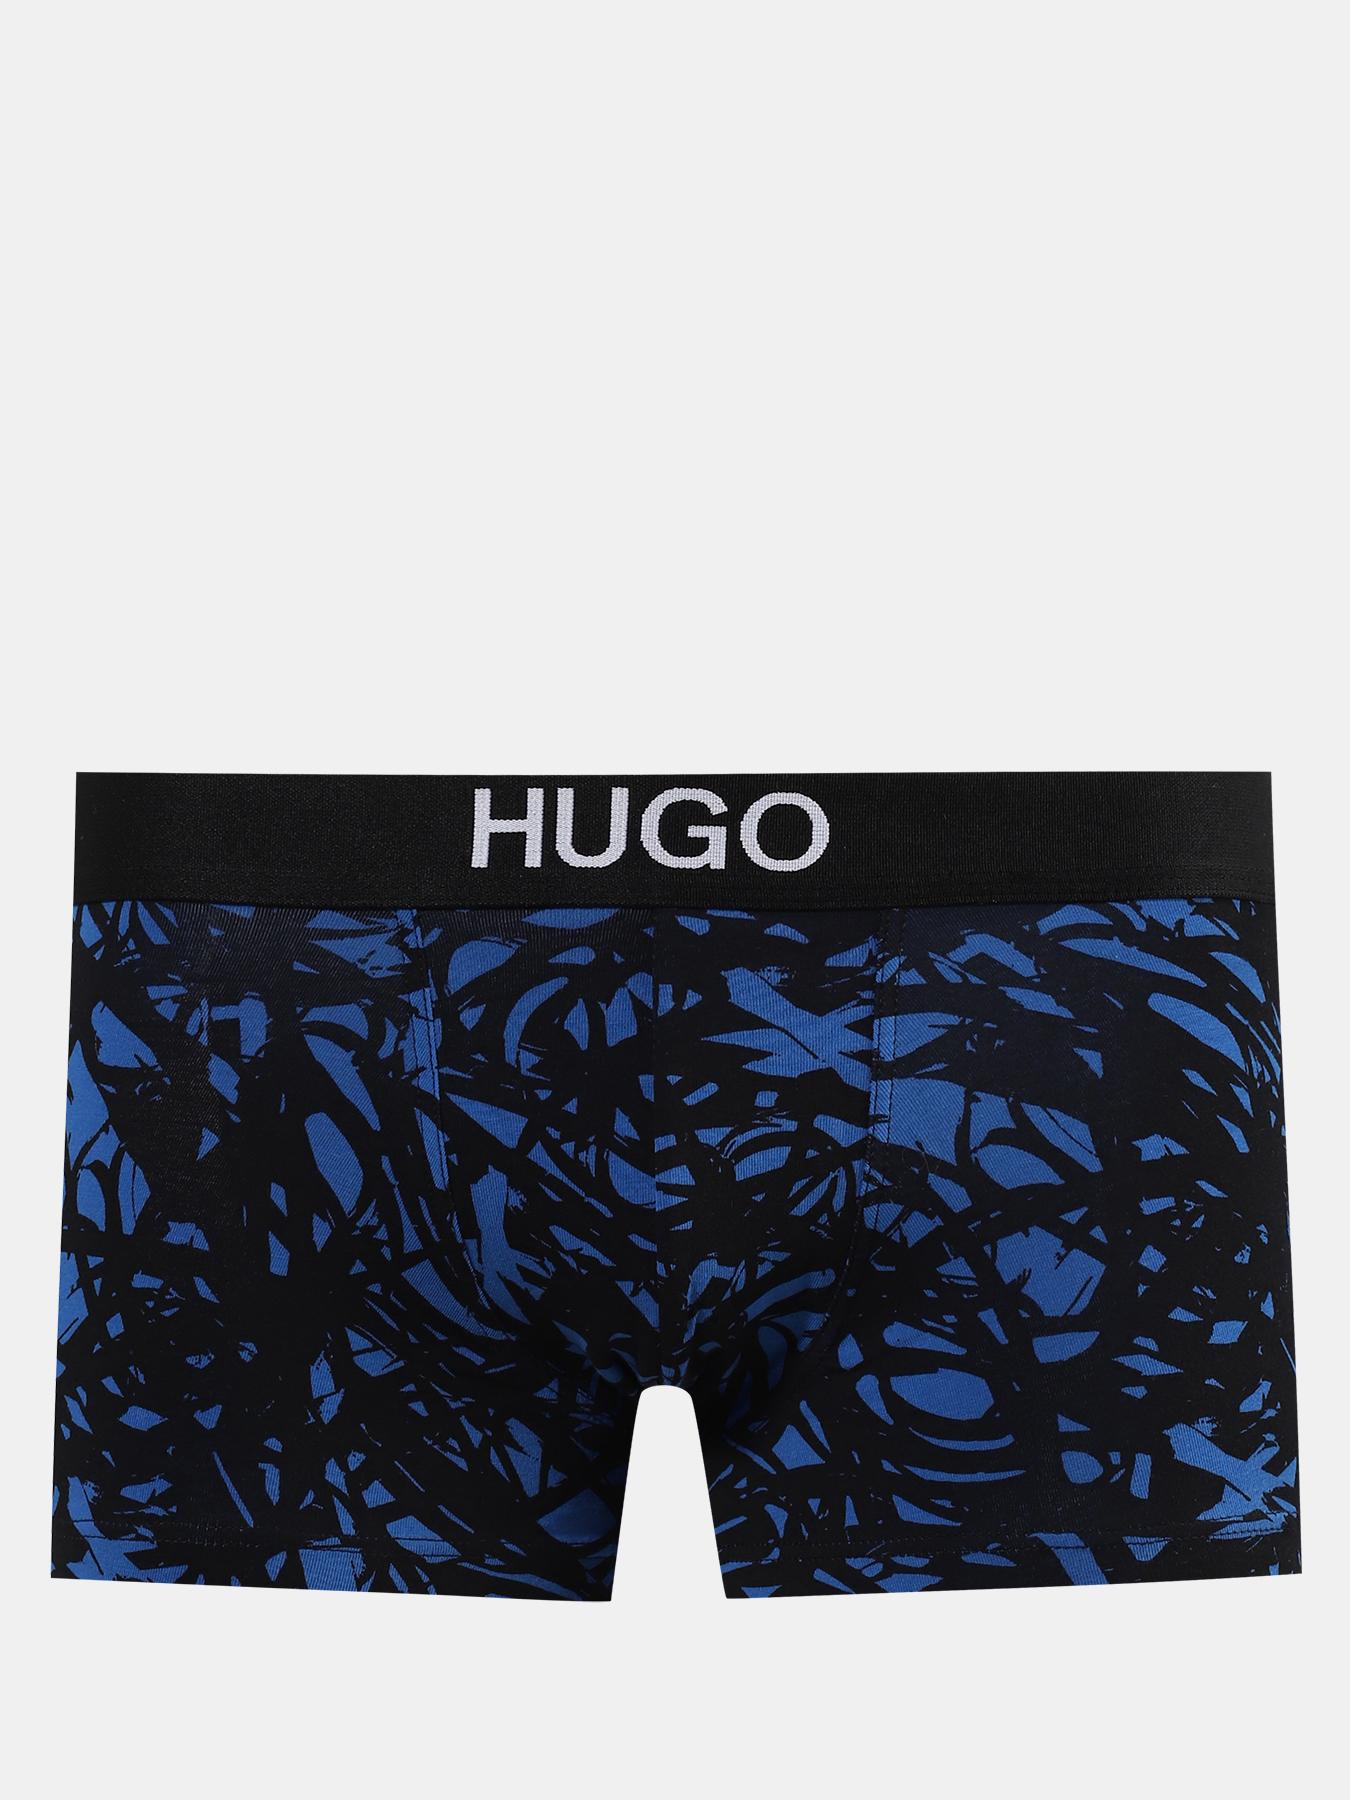 Трусы HUGO Мужские боксеры Trunk Brother (2 шт)